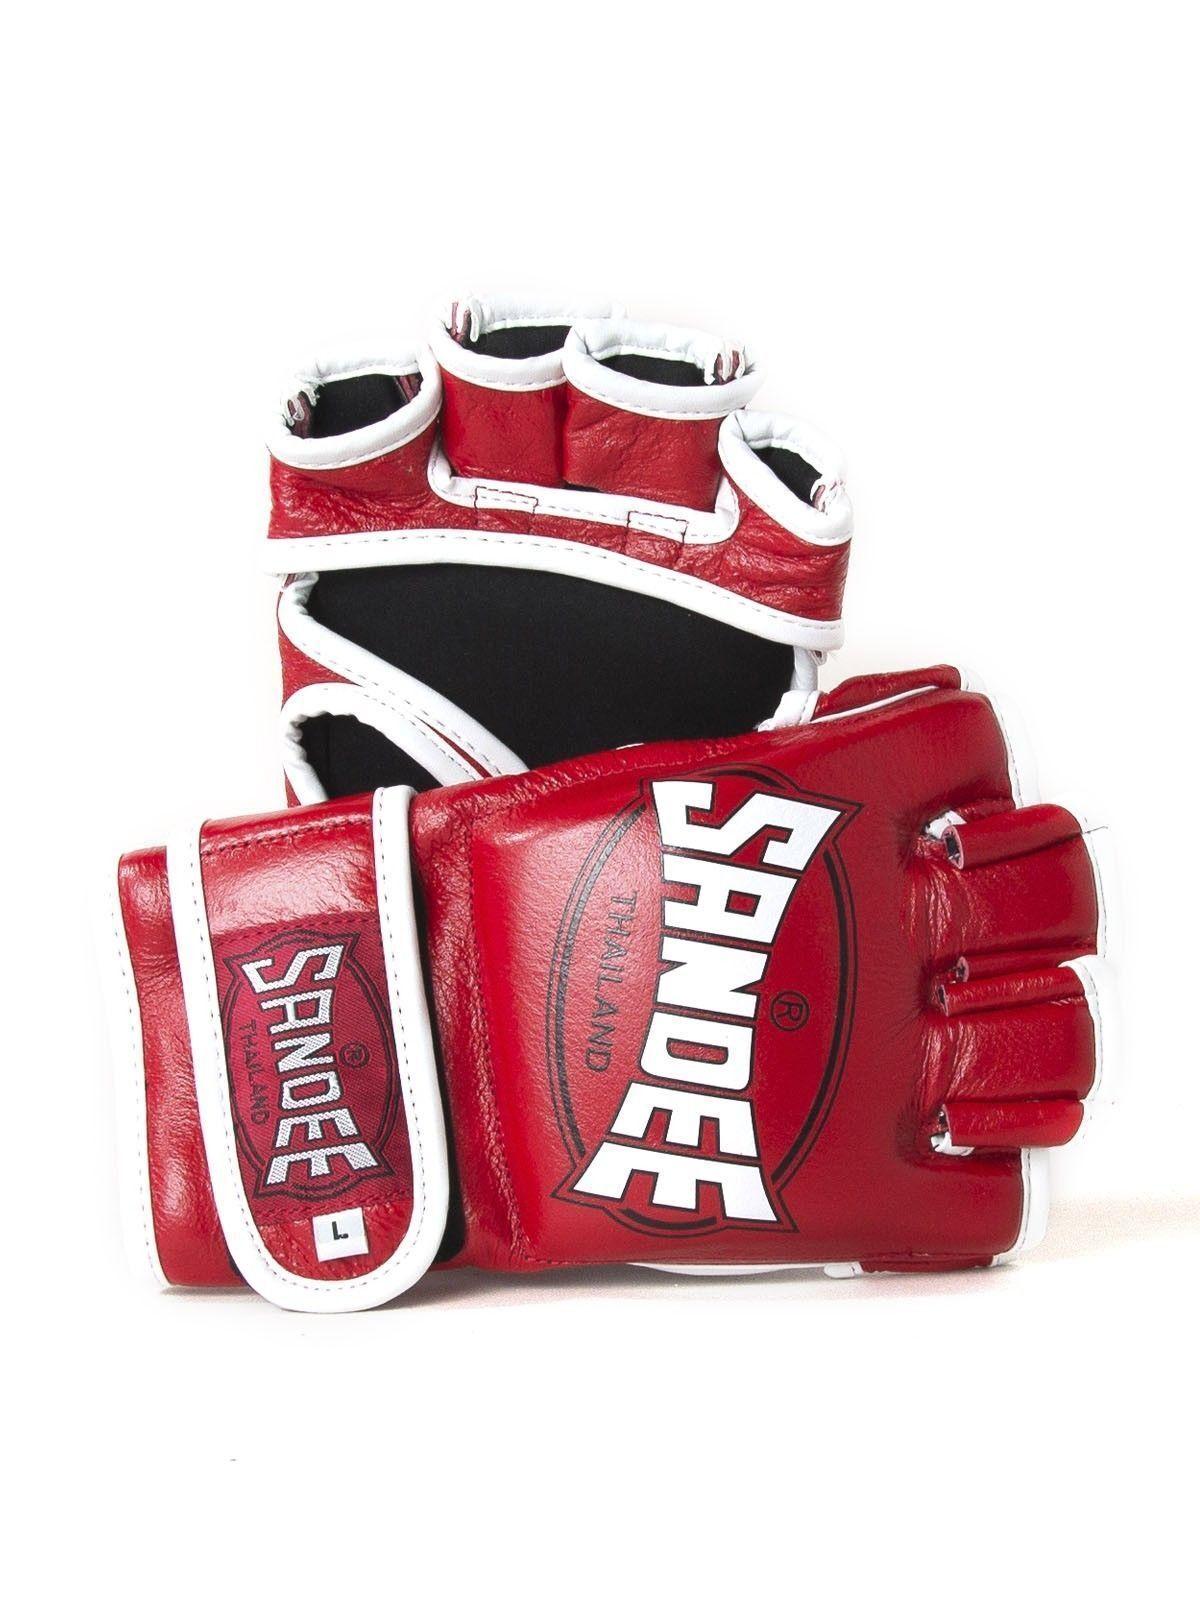 Sandee ROT & Weiß Leder MMA Fight Gloves